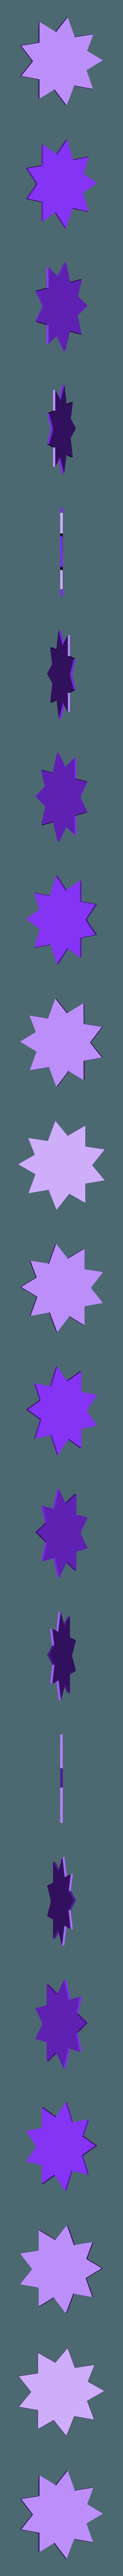 étoiles1.stl Download STL file snow stars • Model to 3D print, catf3d